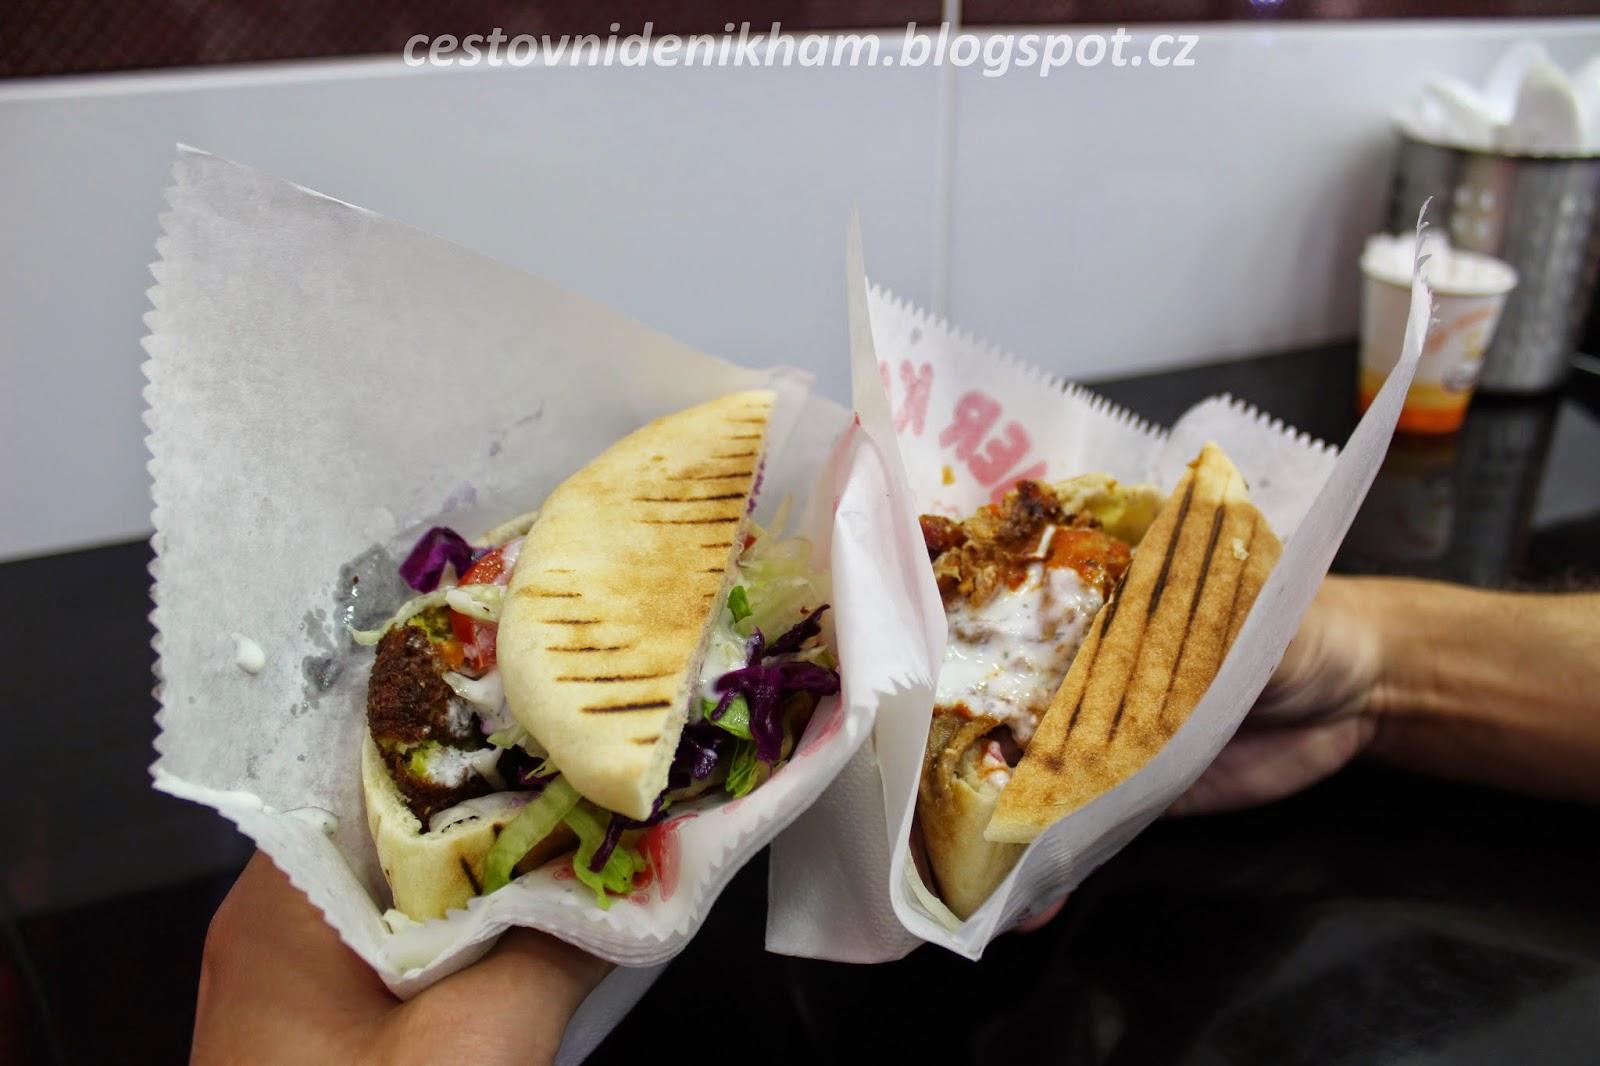 kebab v pita chlebu // kebab pita